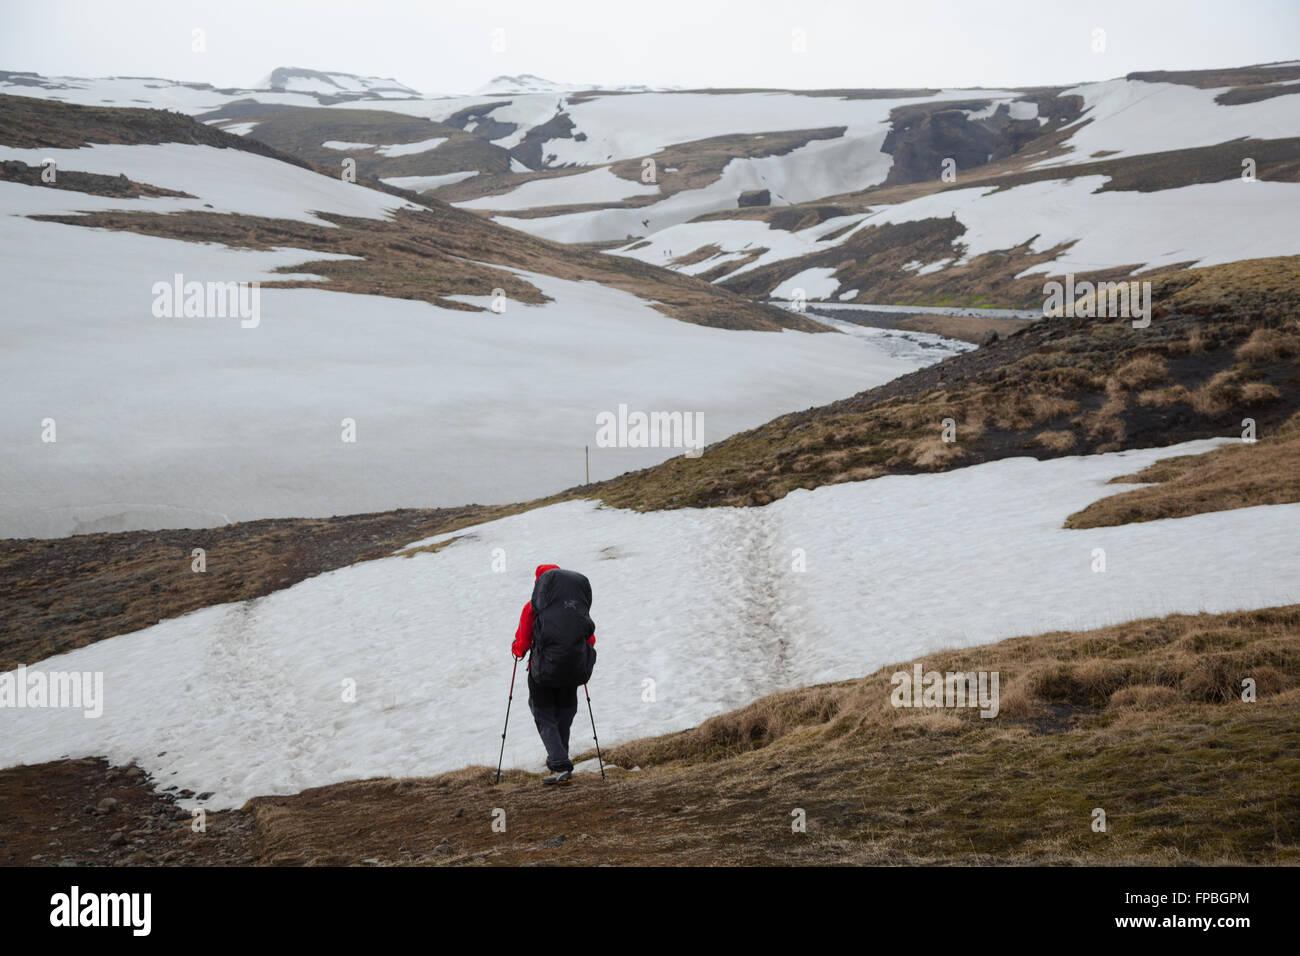 Hiking the Fimmvörðuháls trail, Iceland, Europe - Stock Image